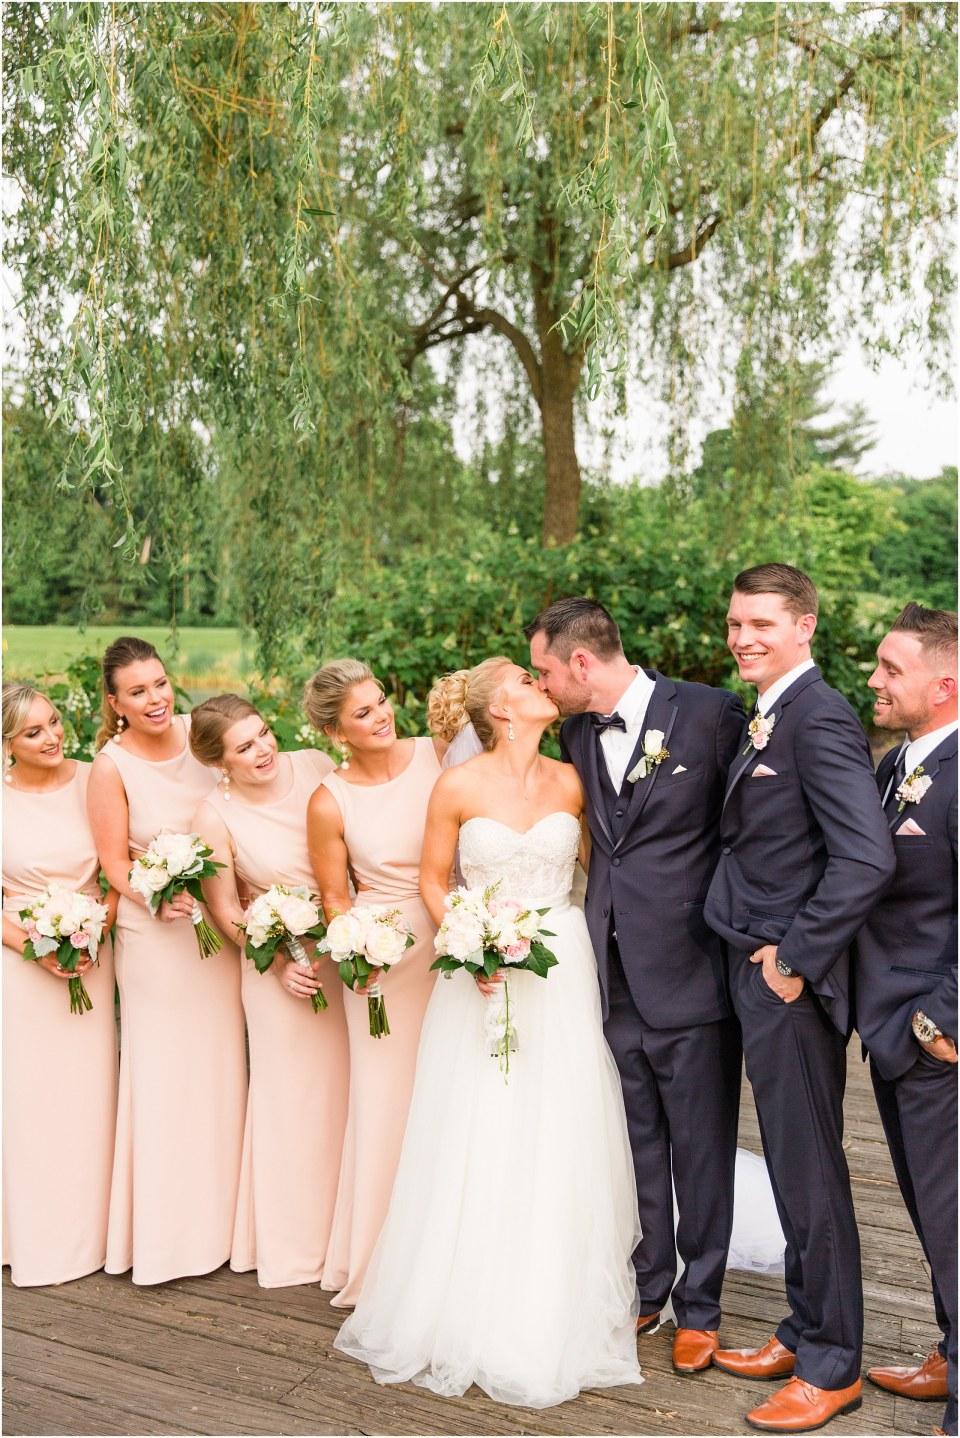 Donovan & Lauren's Navy & Blush Wedding at Talamore Country Club,